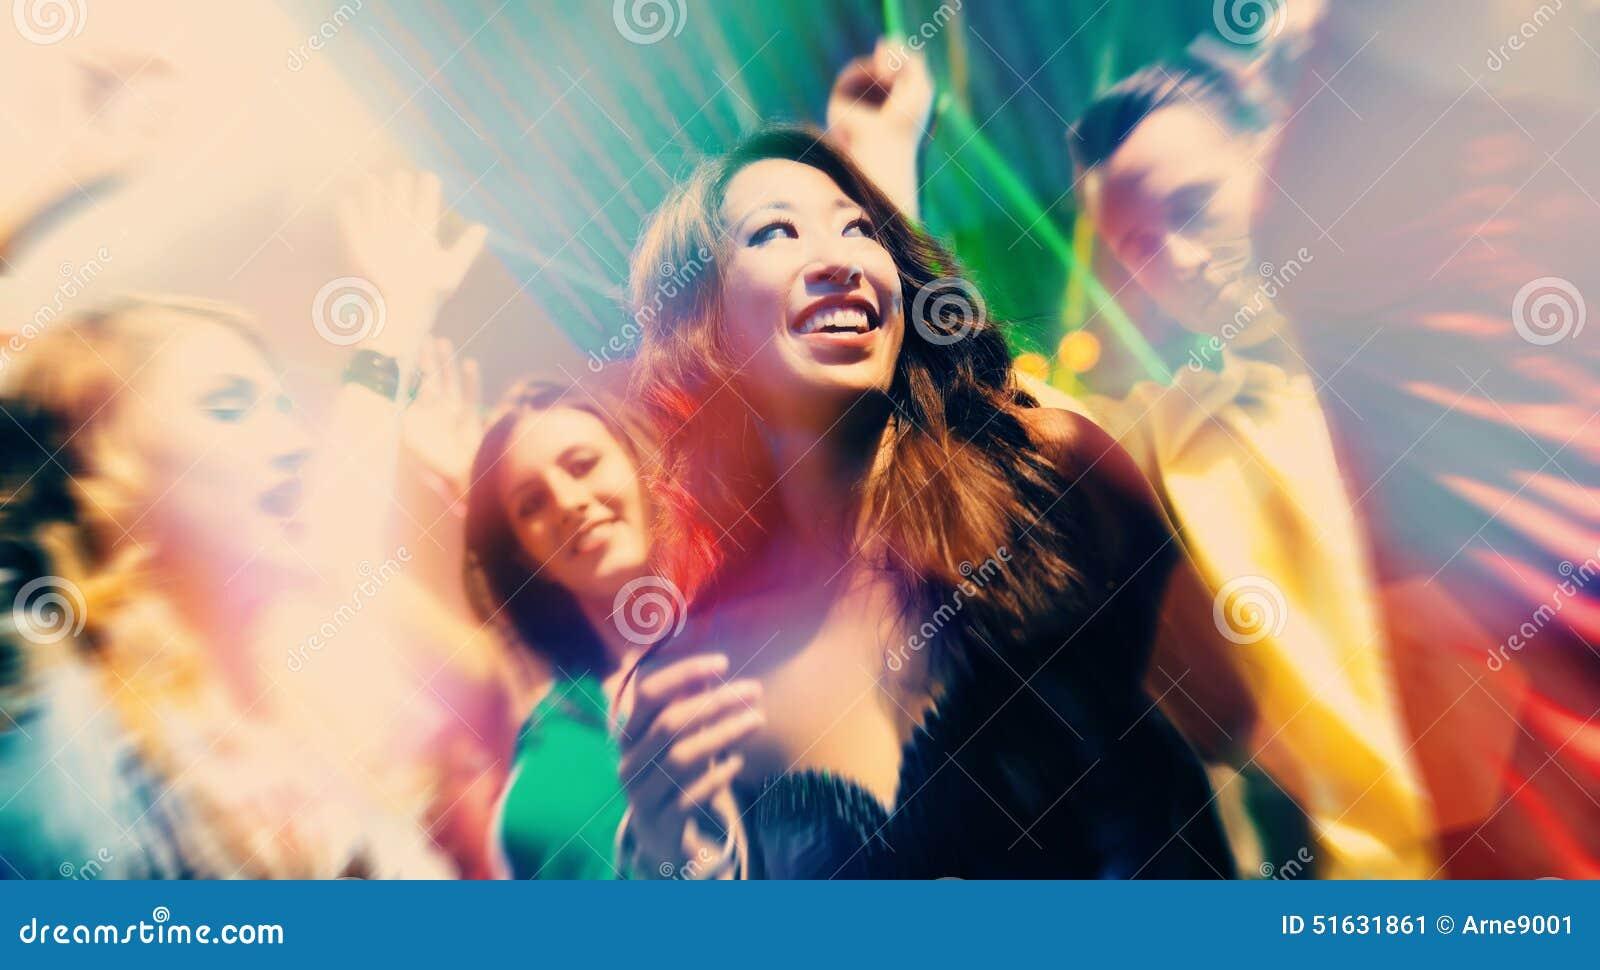 Download 俱乐部跳舞迪斯科聚会人 库存图片. 图片 包括有 晚上, 白种人, 俱乐部, 人群, 棍打, 喜悦, 舞蹈 - 51631861